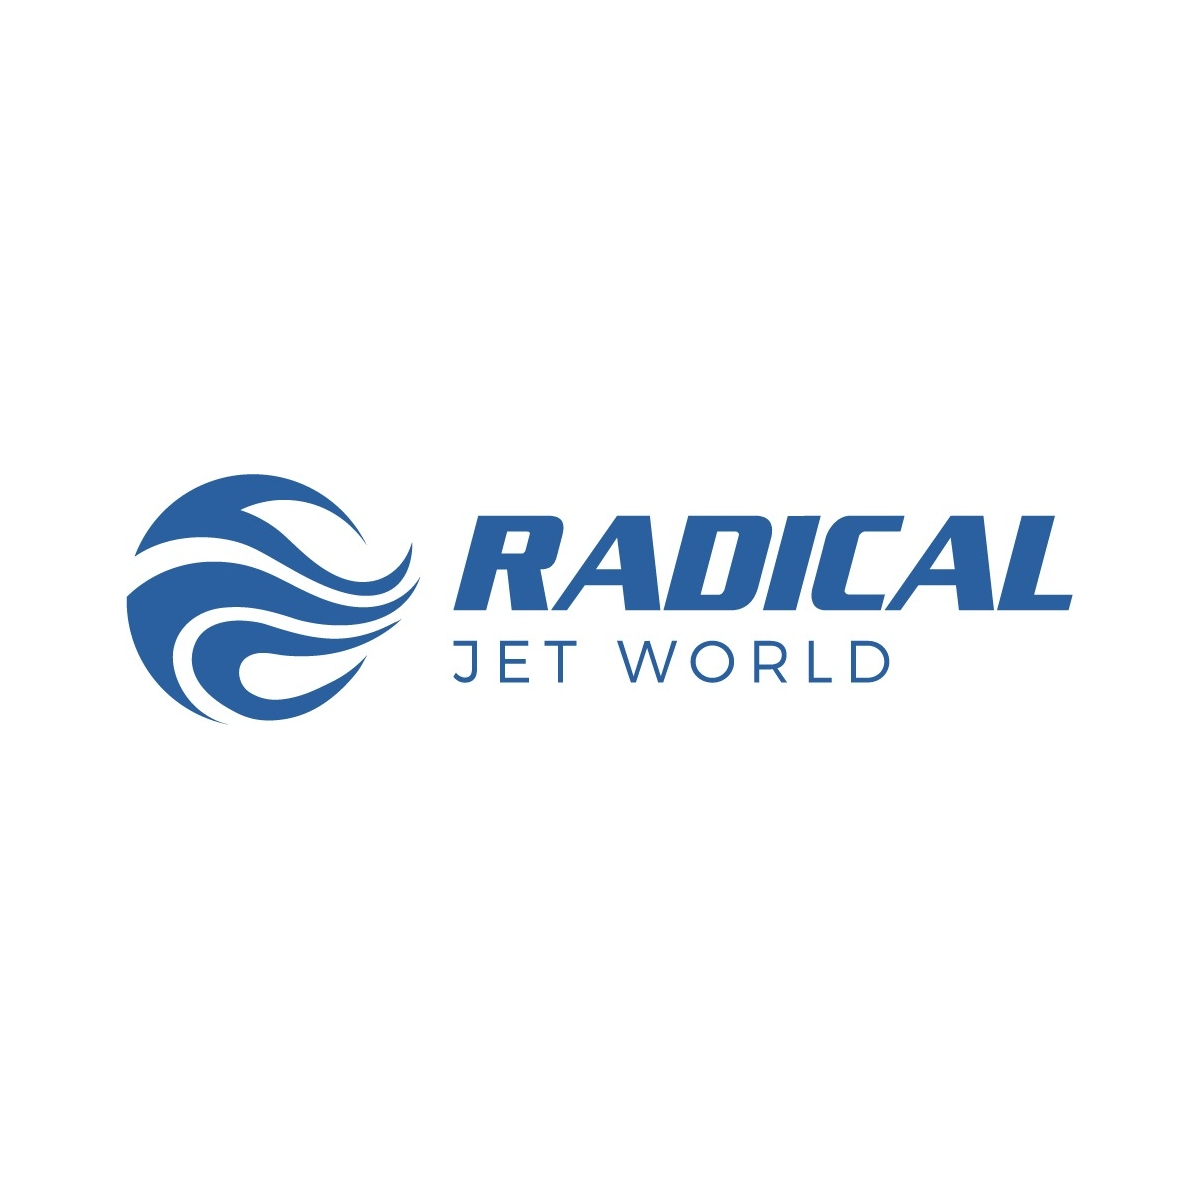 Cachimbo de Vela para Jet Ski Sea doo 4 tempos (bobina) Radical  - Radical Peças - Peças para Jet Ski